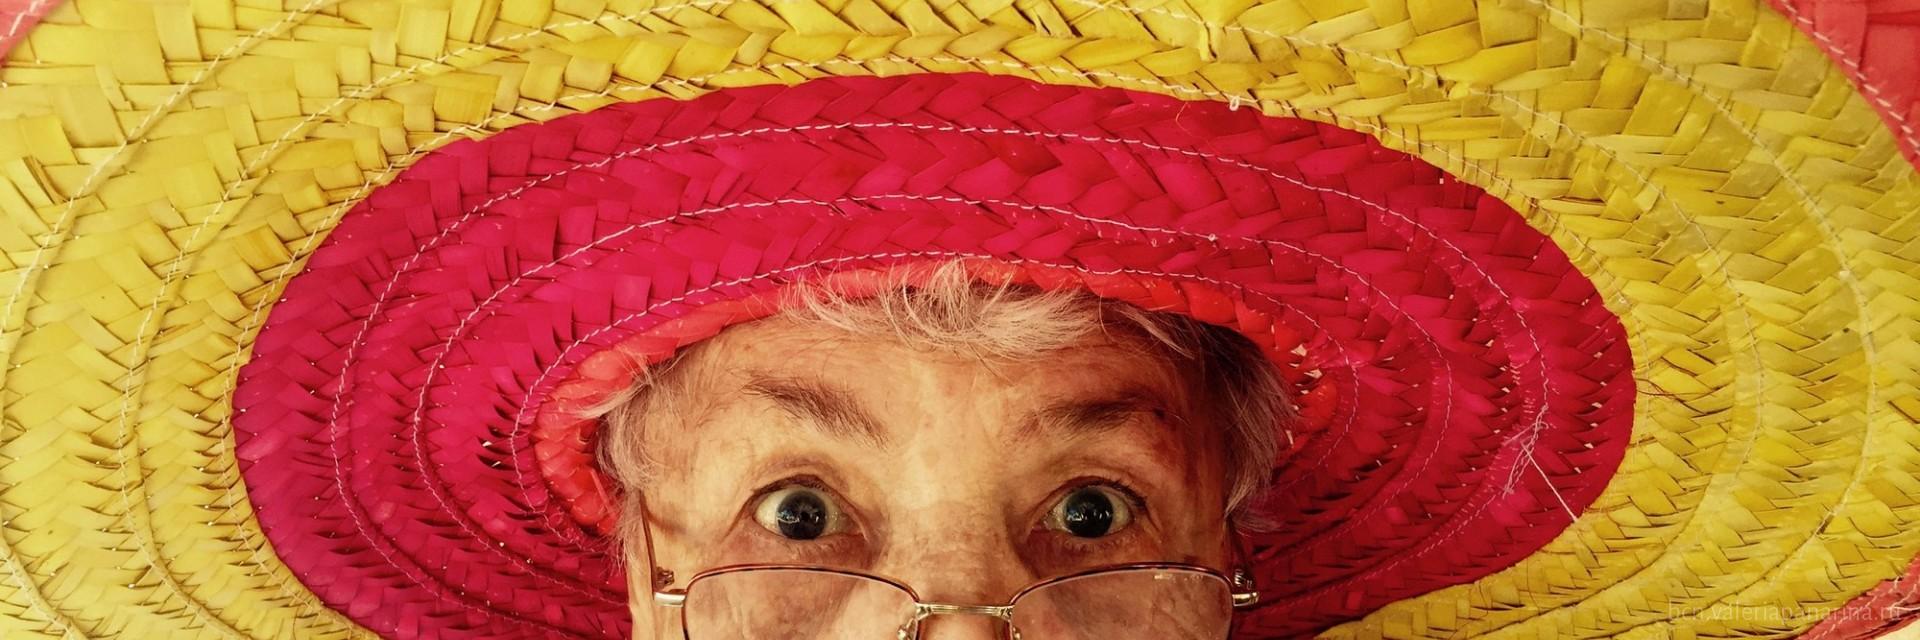 Традиции Испании: странно, весело, мистично